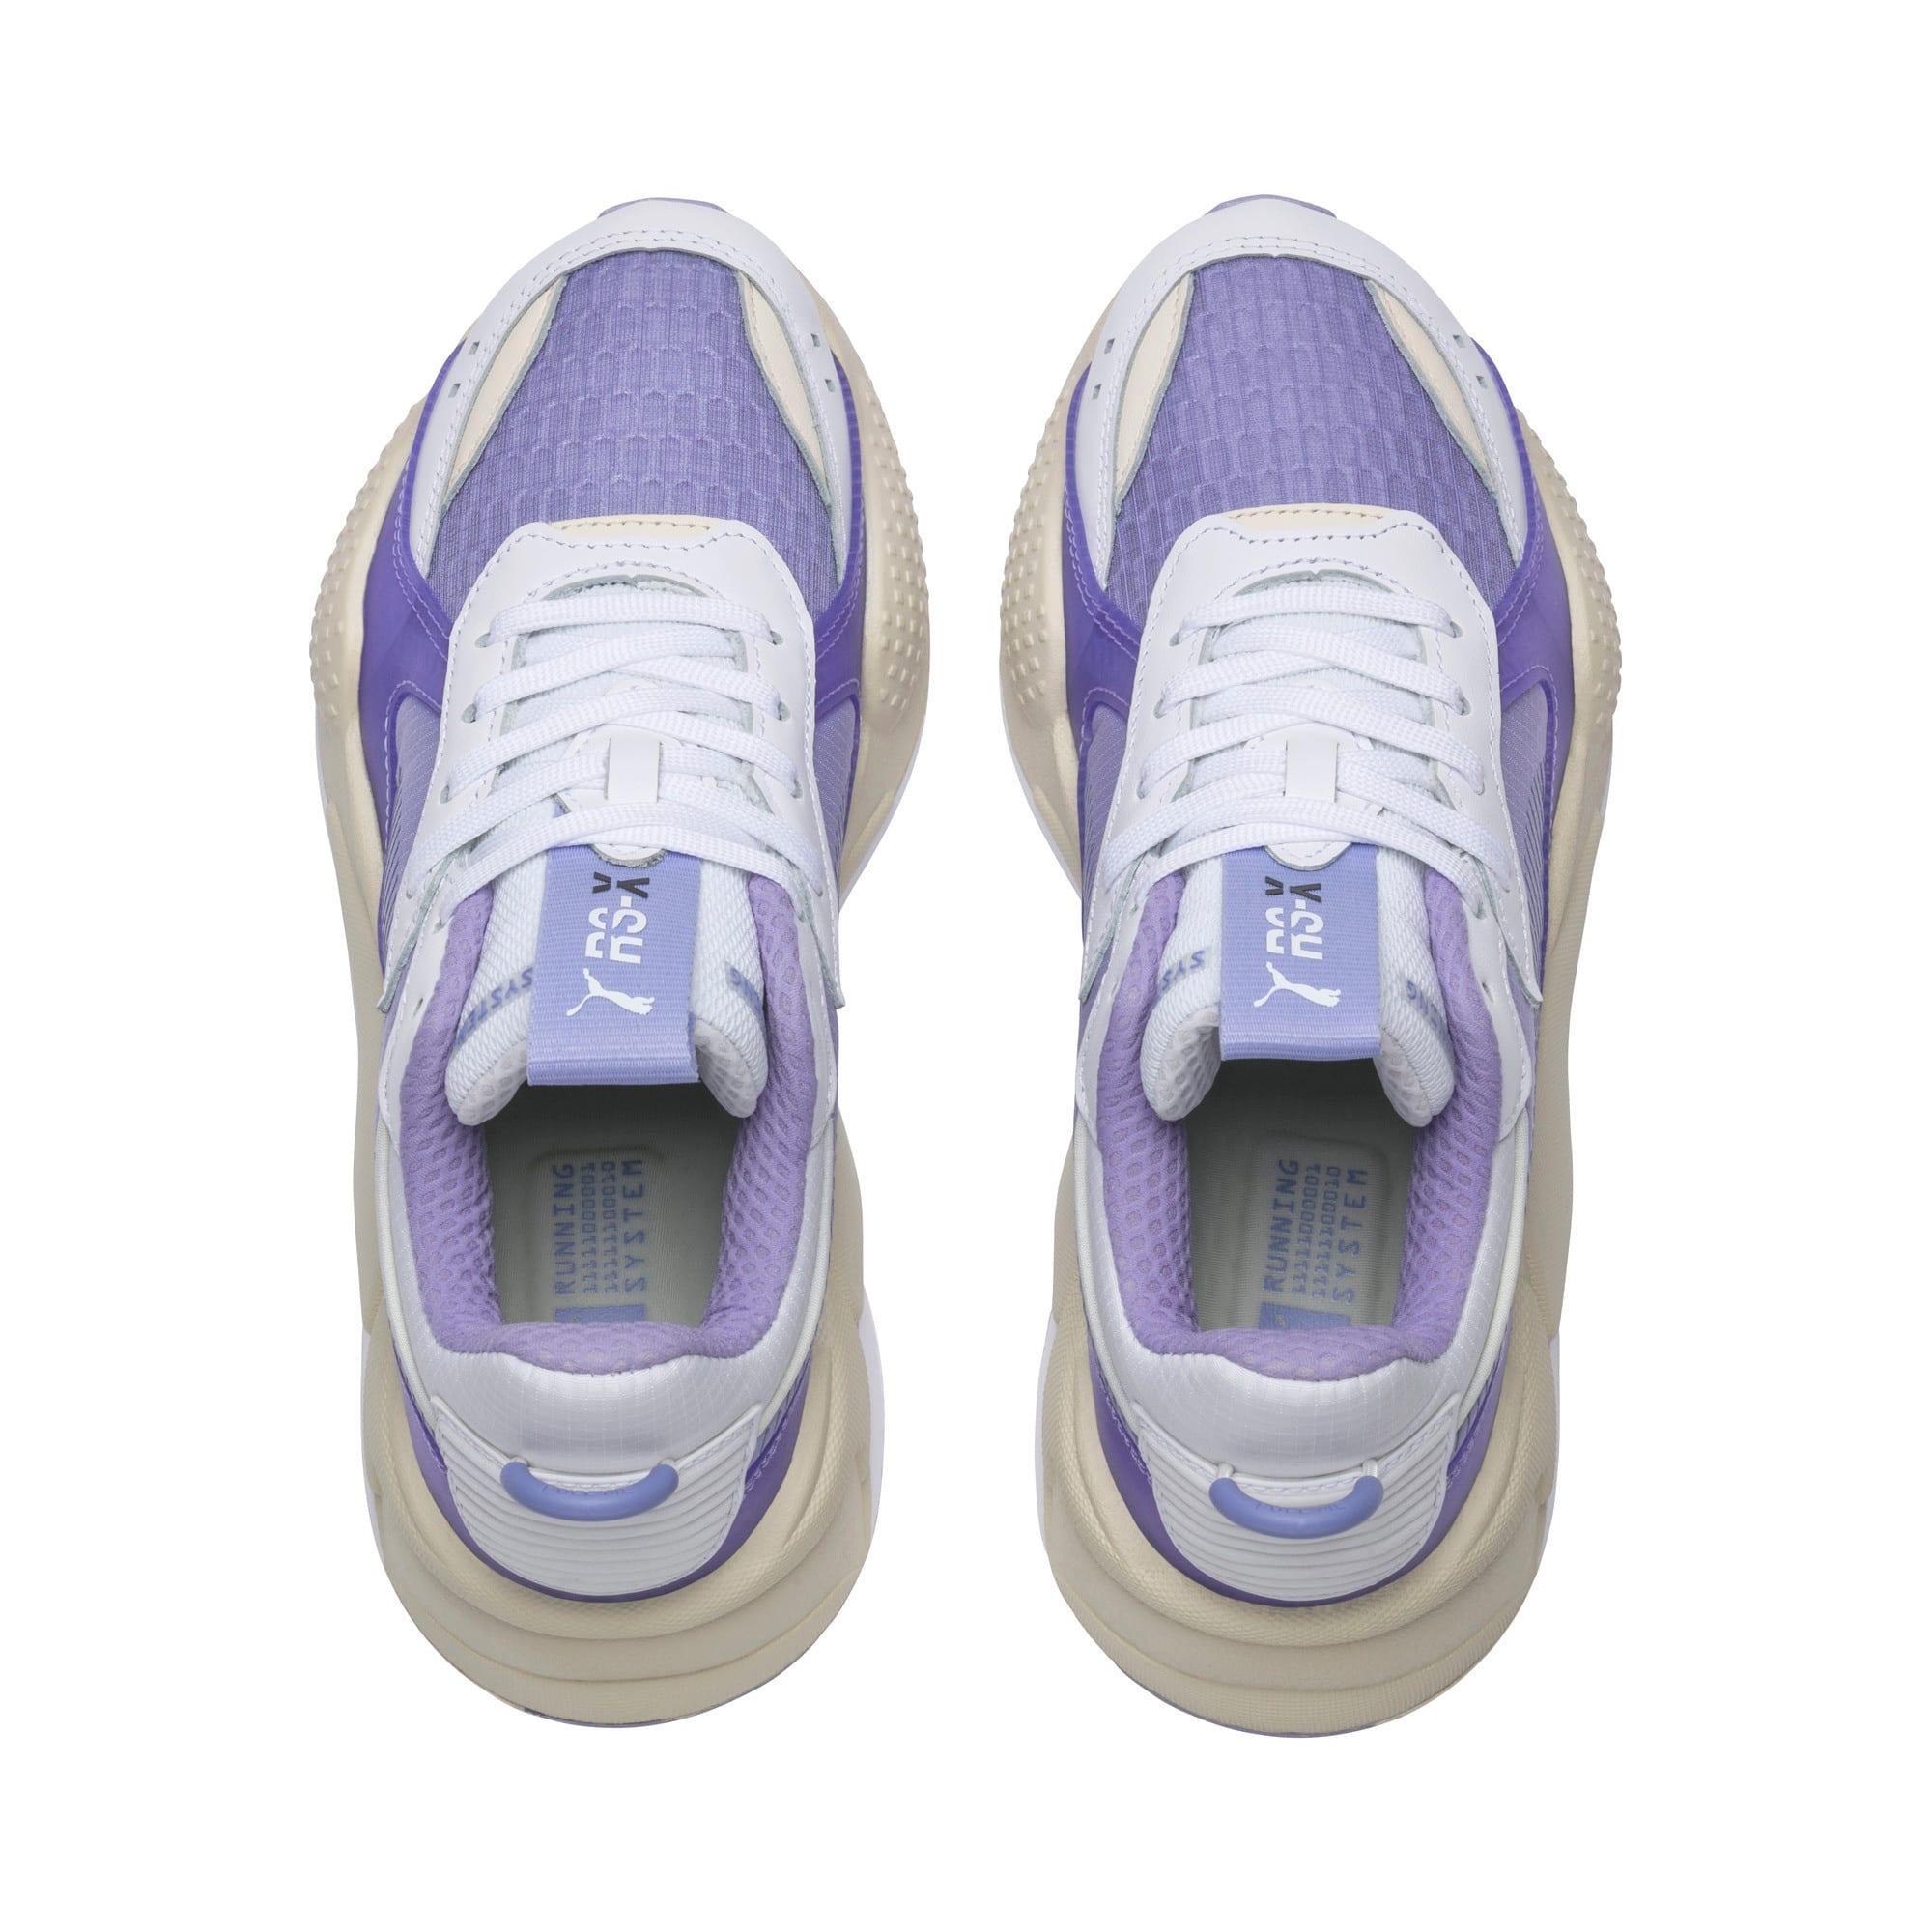 Thumbnail 6 of RS-X Tech Sneaker, Puma White-Sweet Lavender, medium